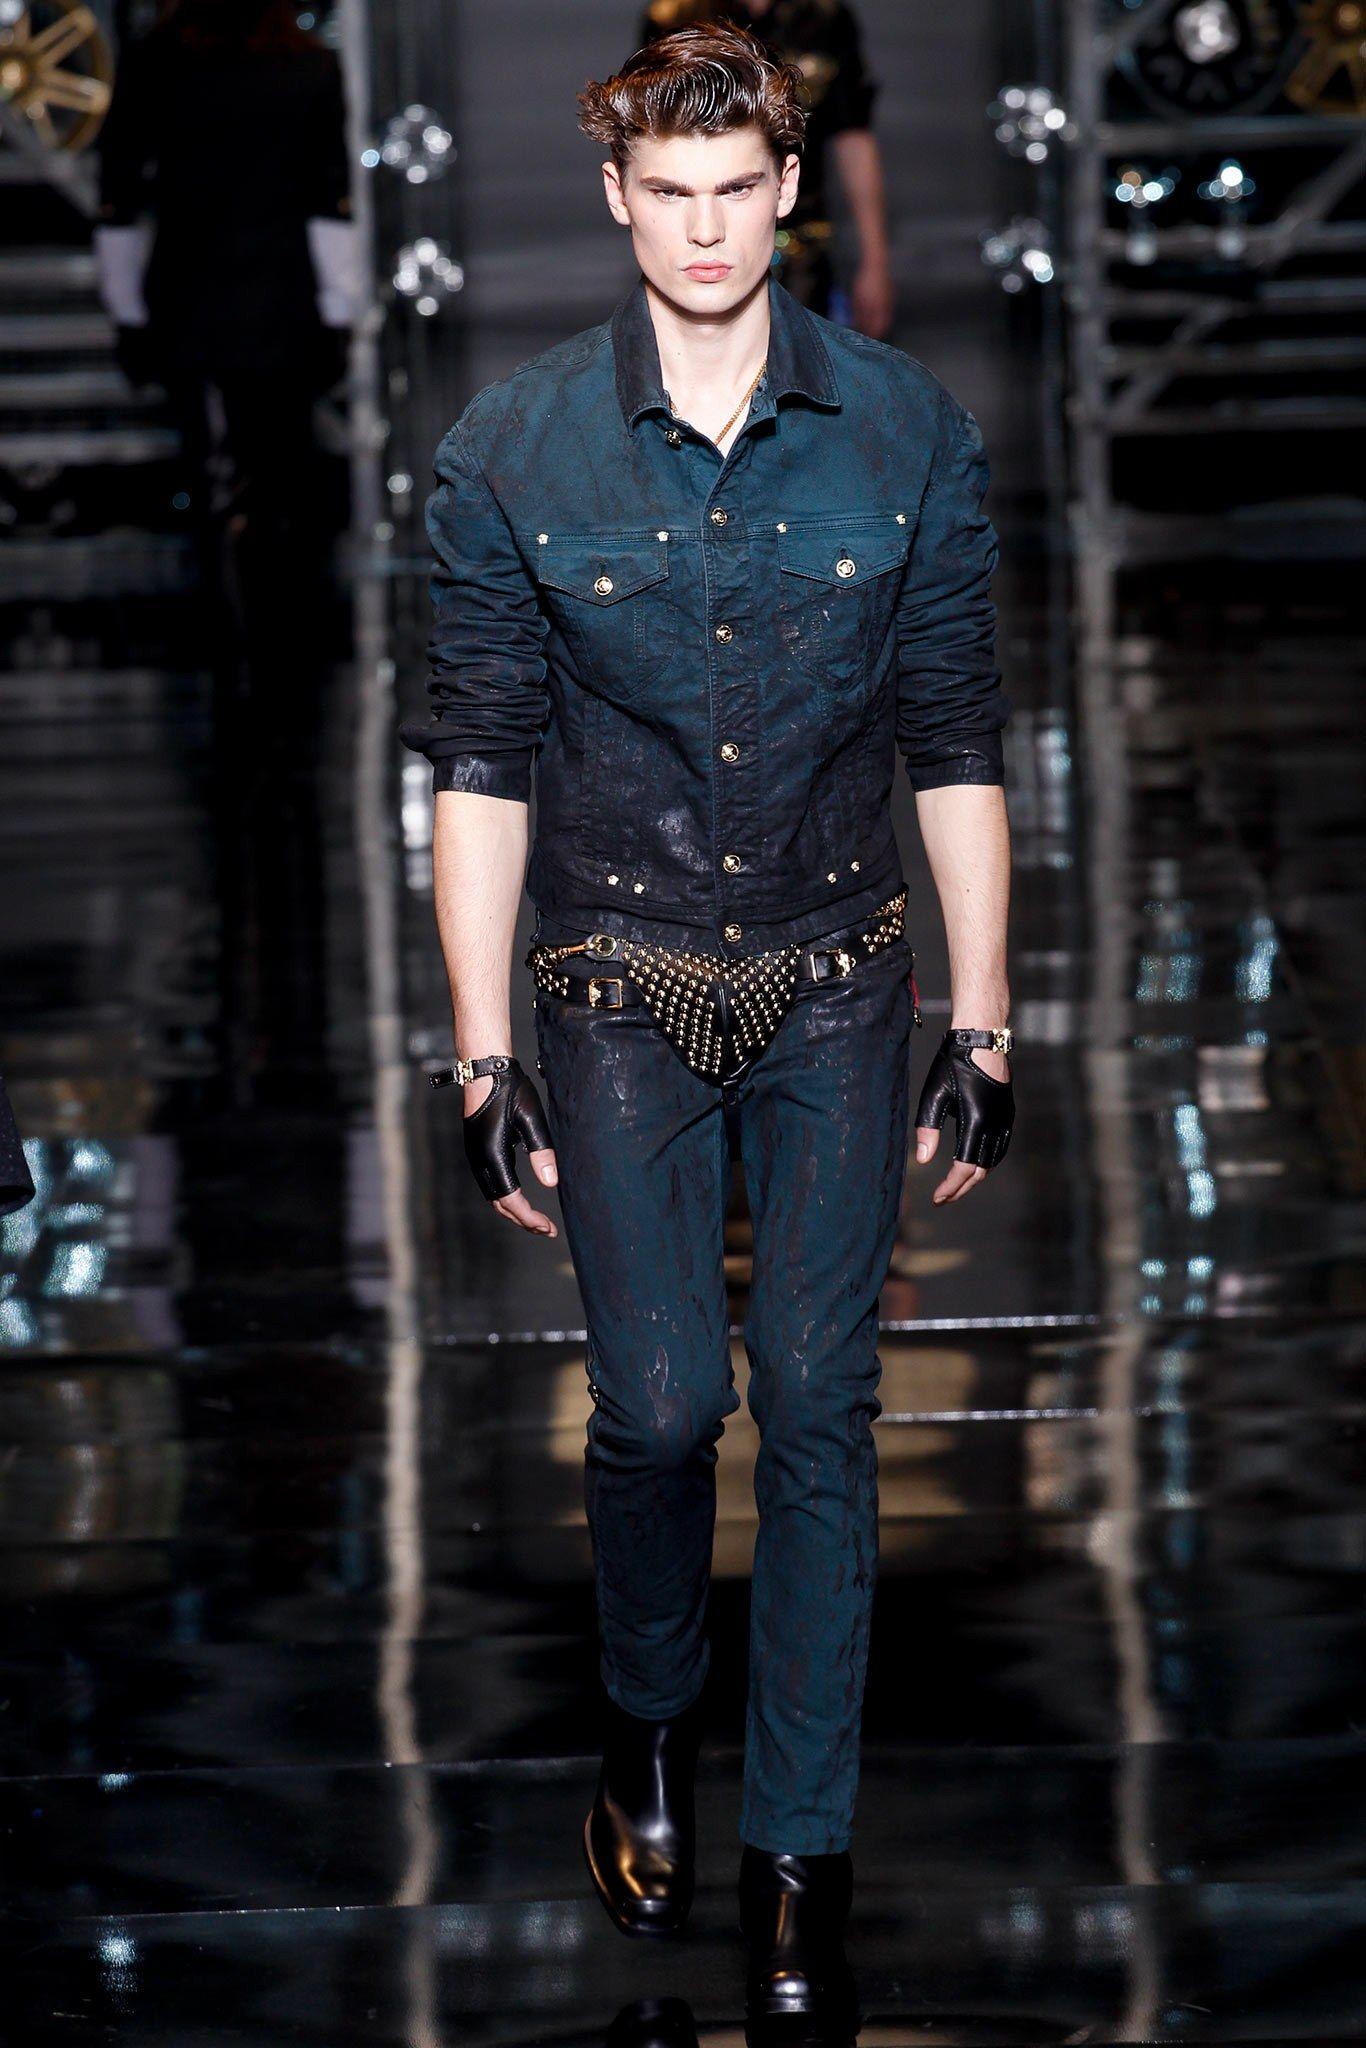 Versace Fall 2014 Menswear Fashion Show Menswear Versace Men Fashion Men 2014